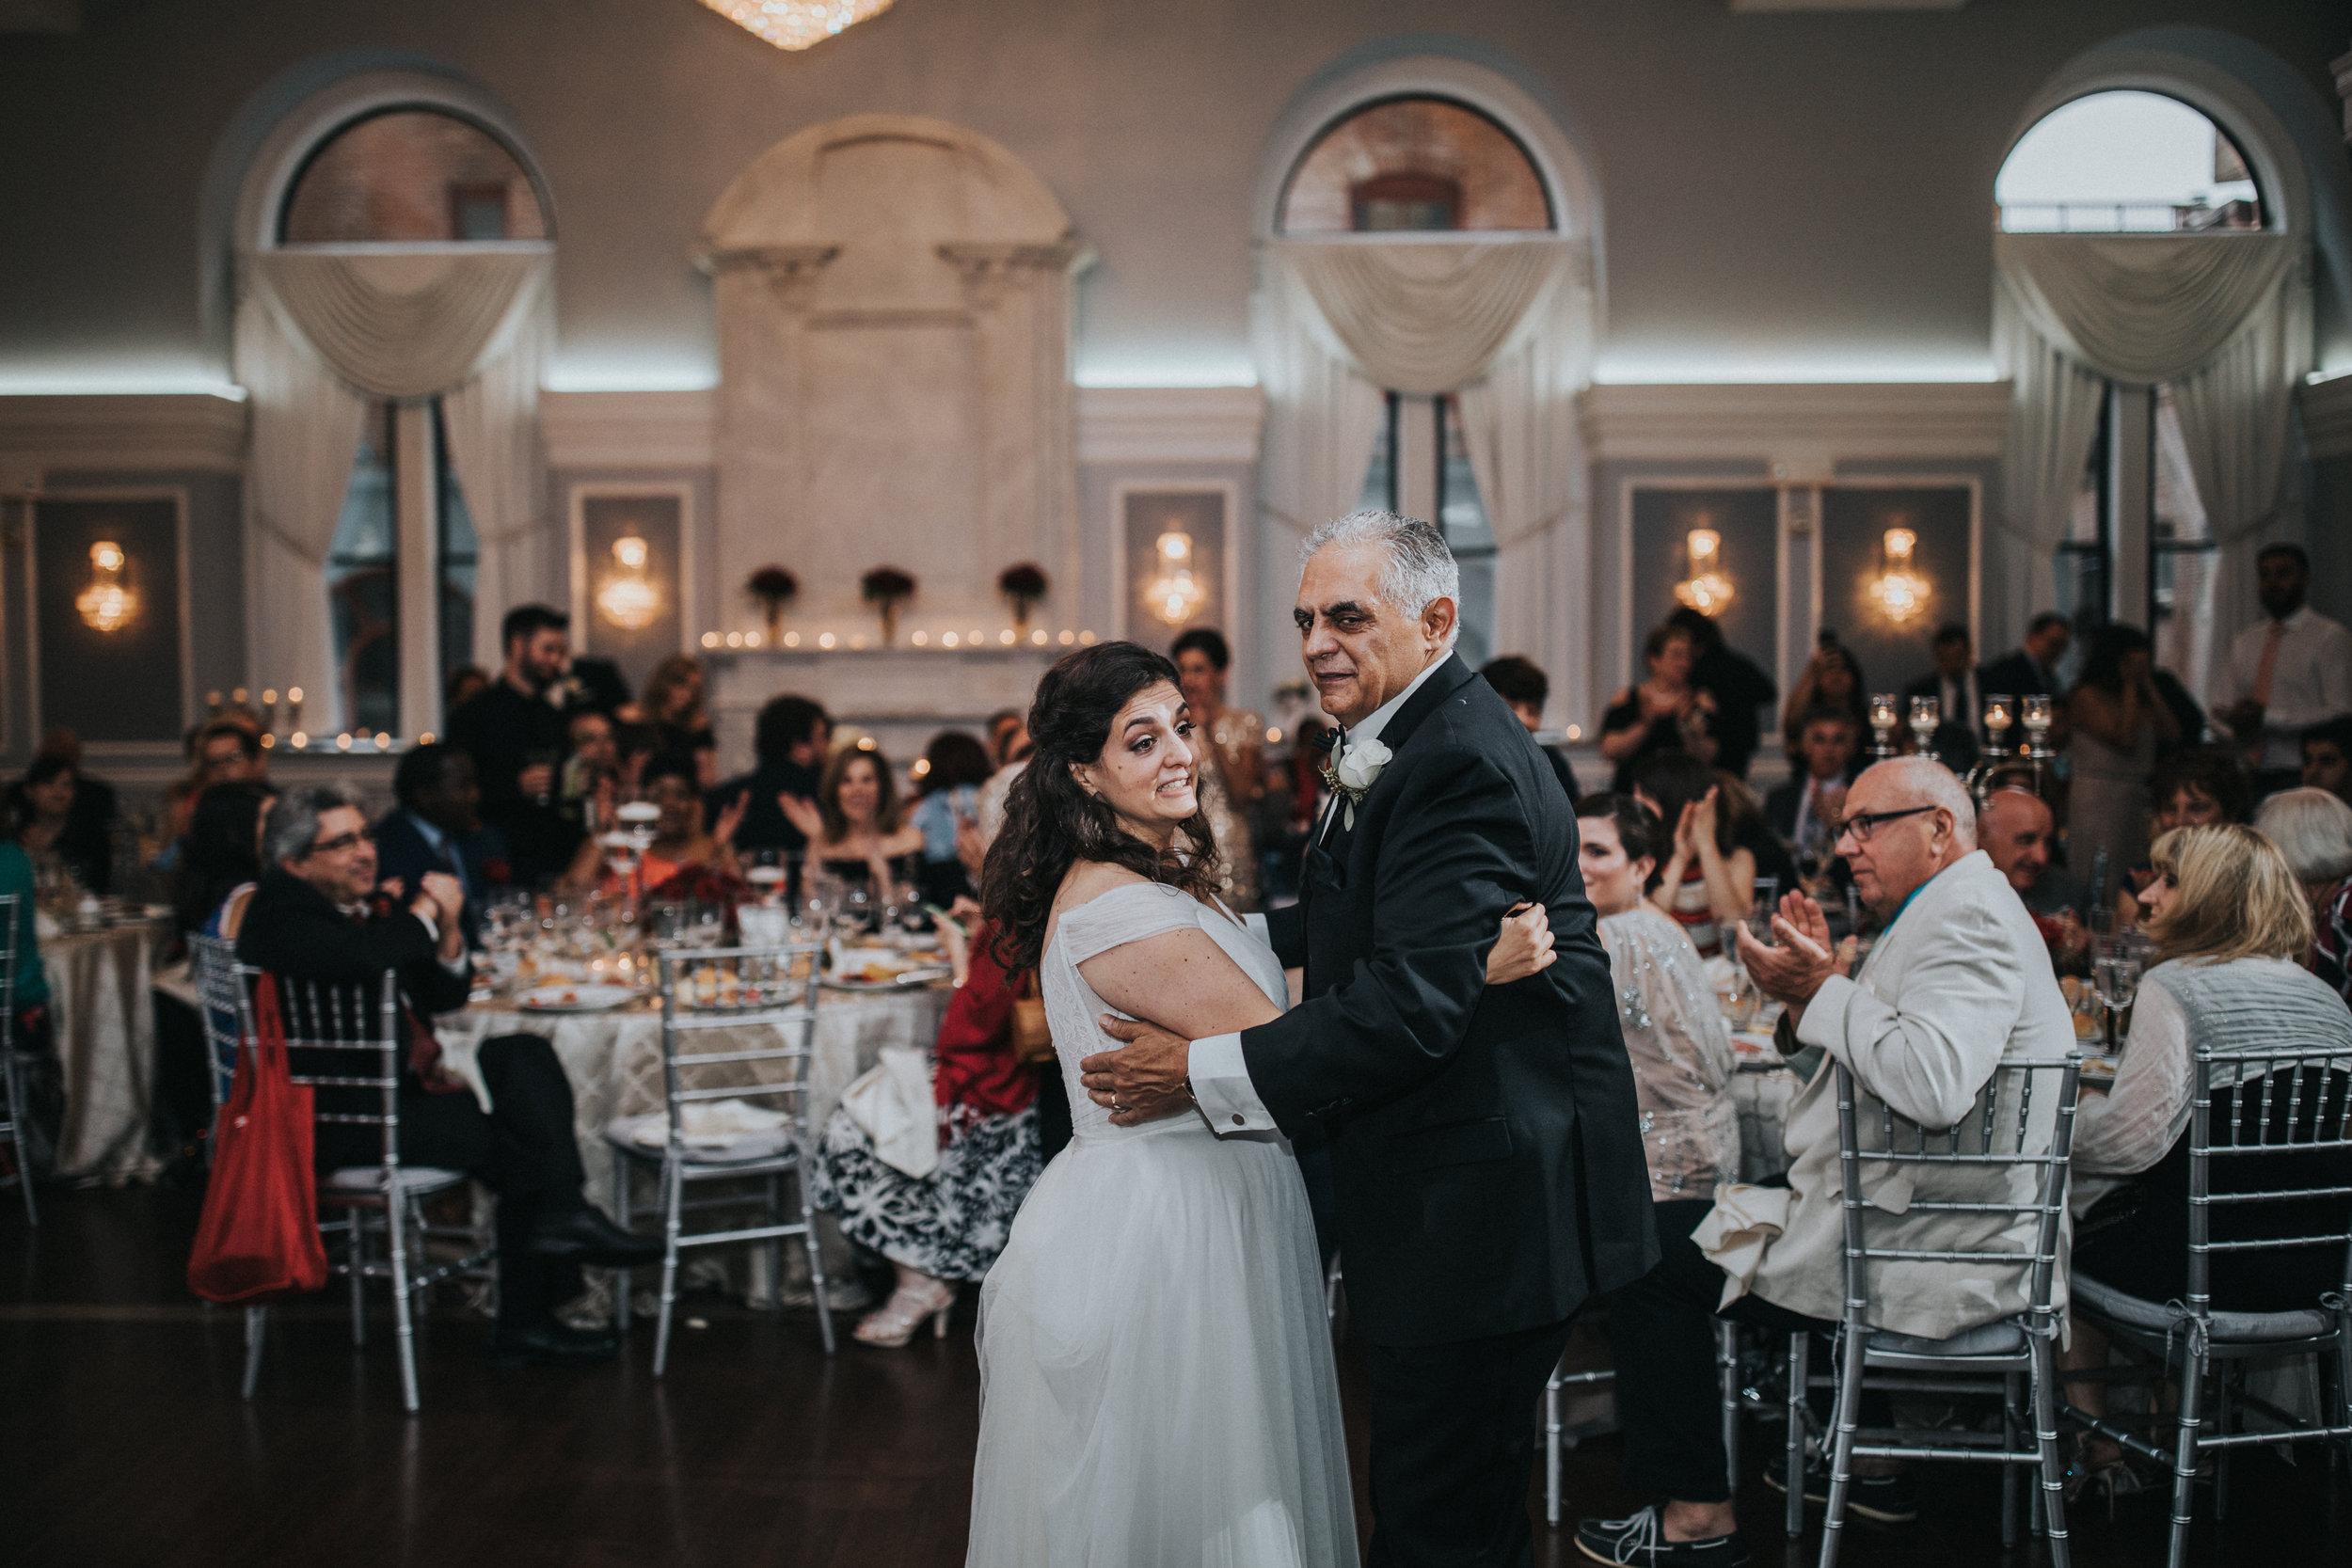 JennaLynnPhotography-NJWeddingPhotographer-Philadelphia-Wedding-ArtsBallroom-Reception-94.jpg